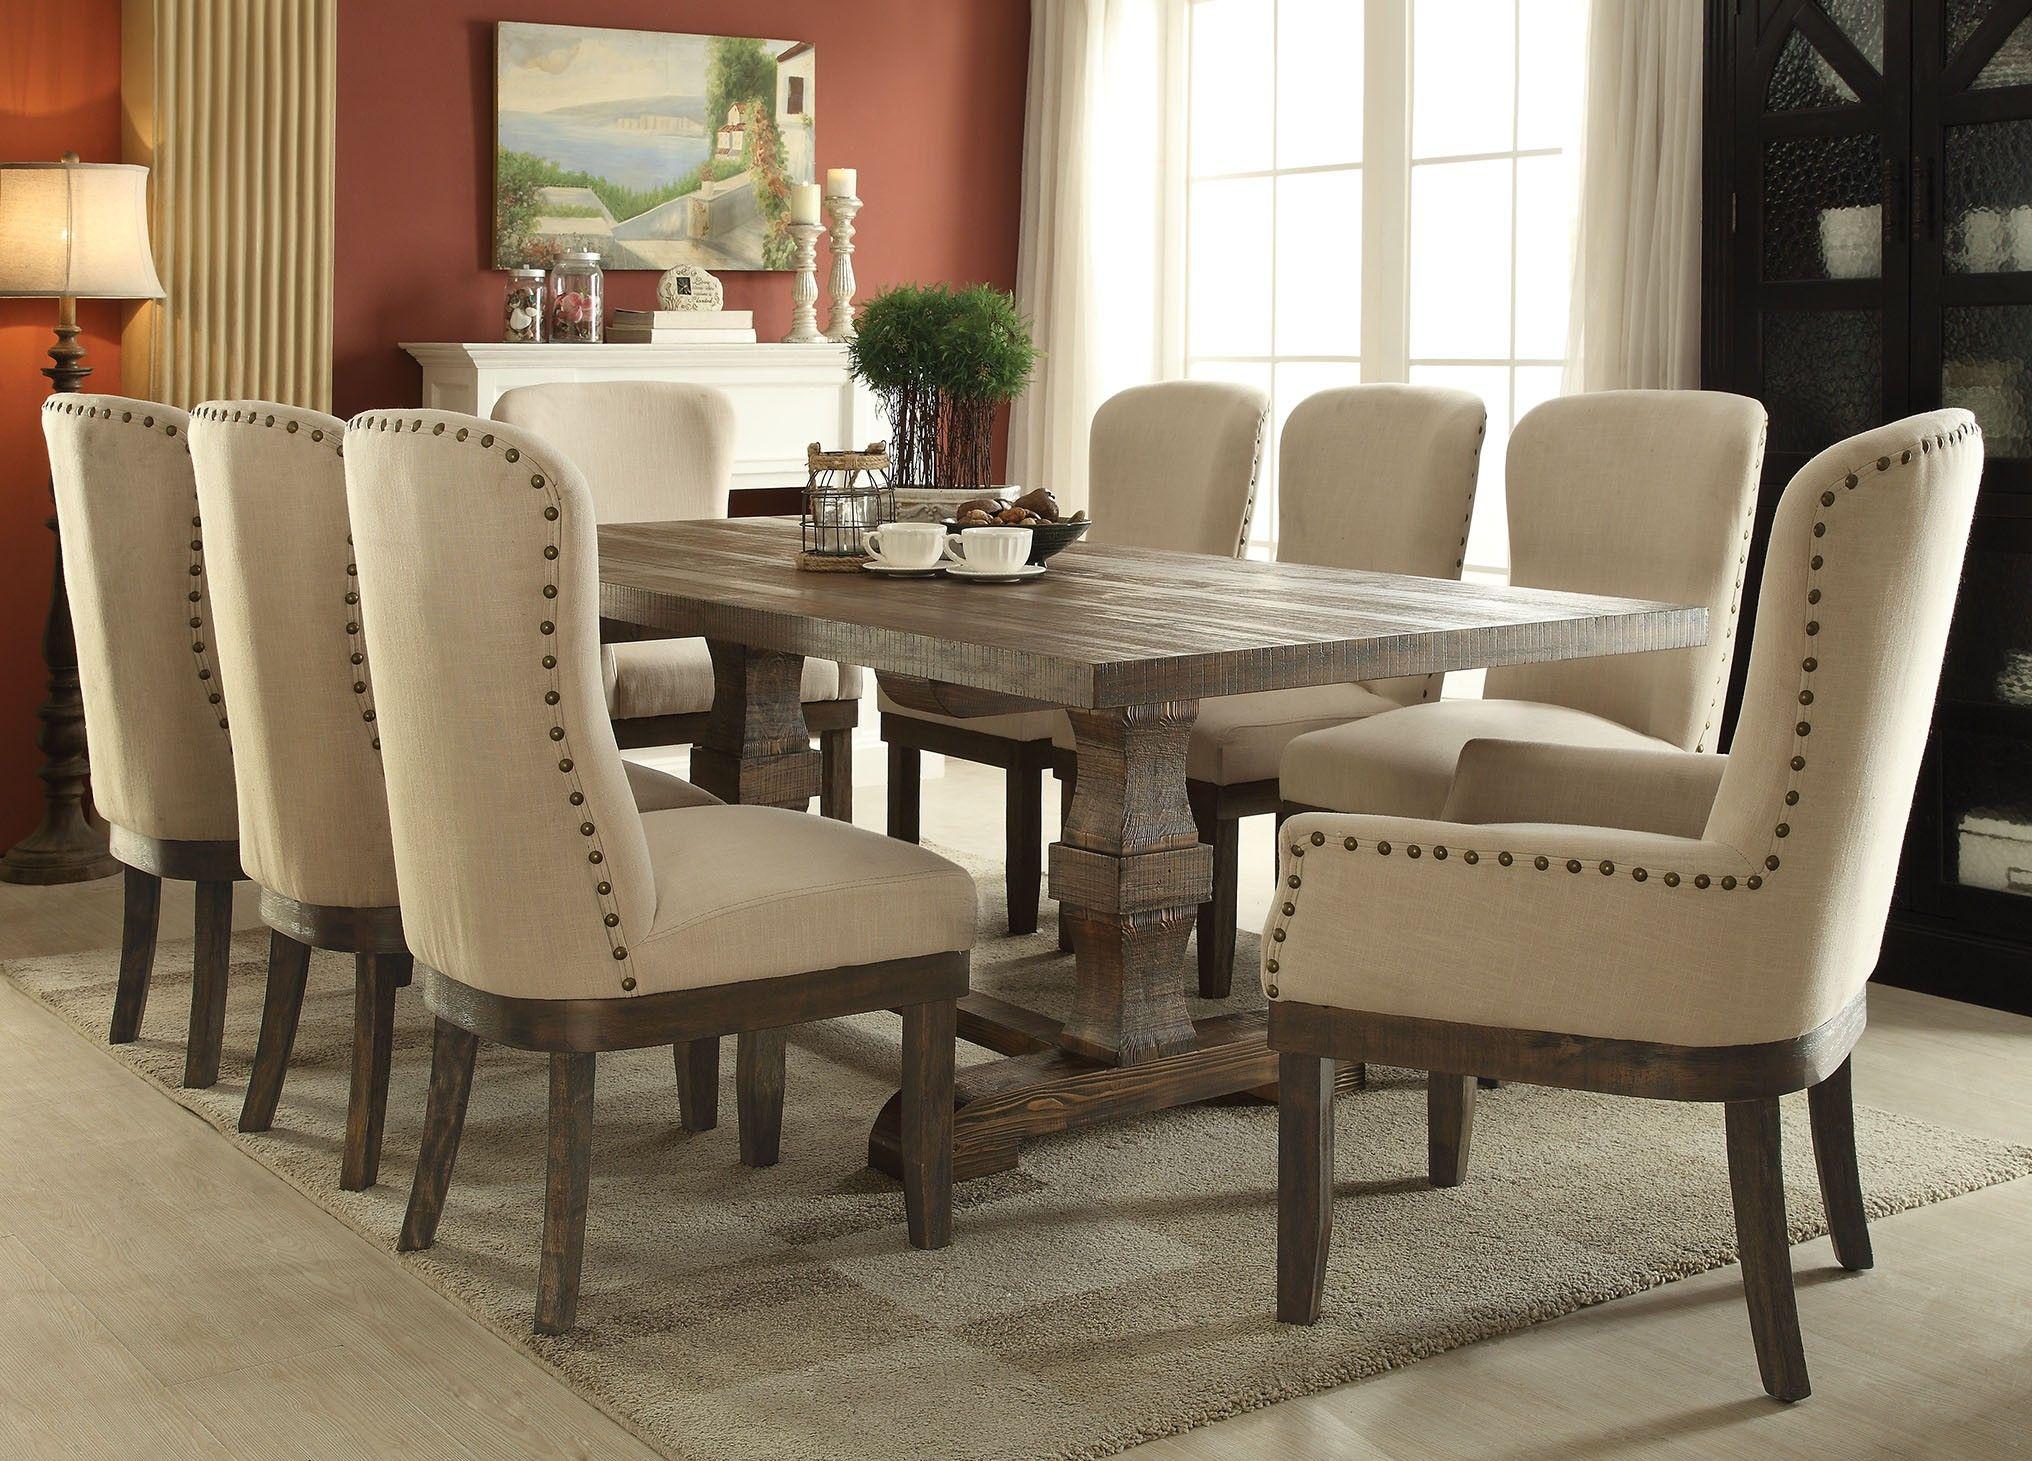 Acme 60737 Landon 7 Pcs Salvage Brown Pedestal Dining Set With